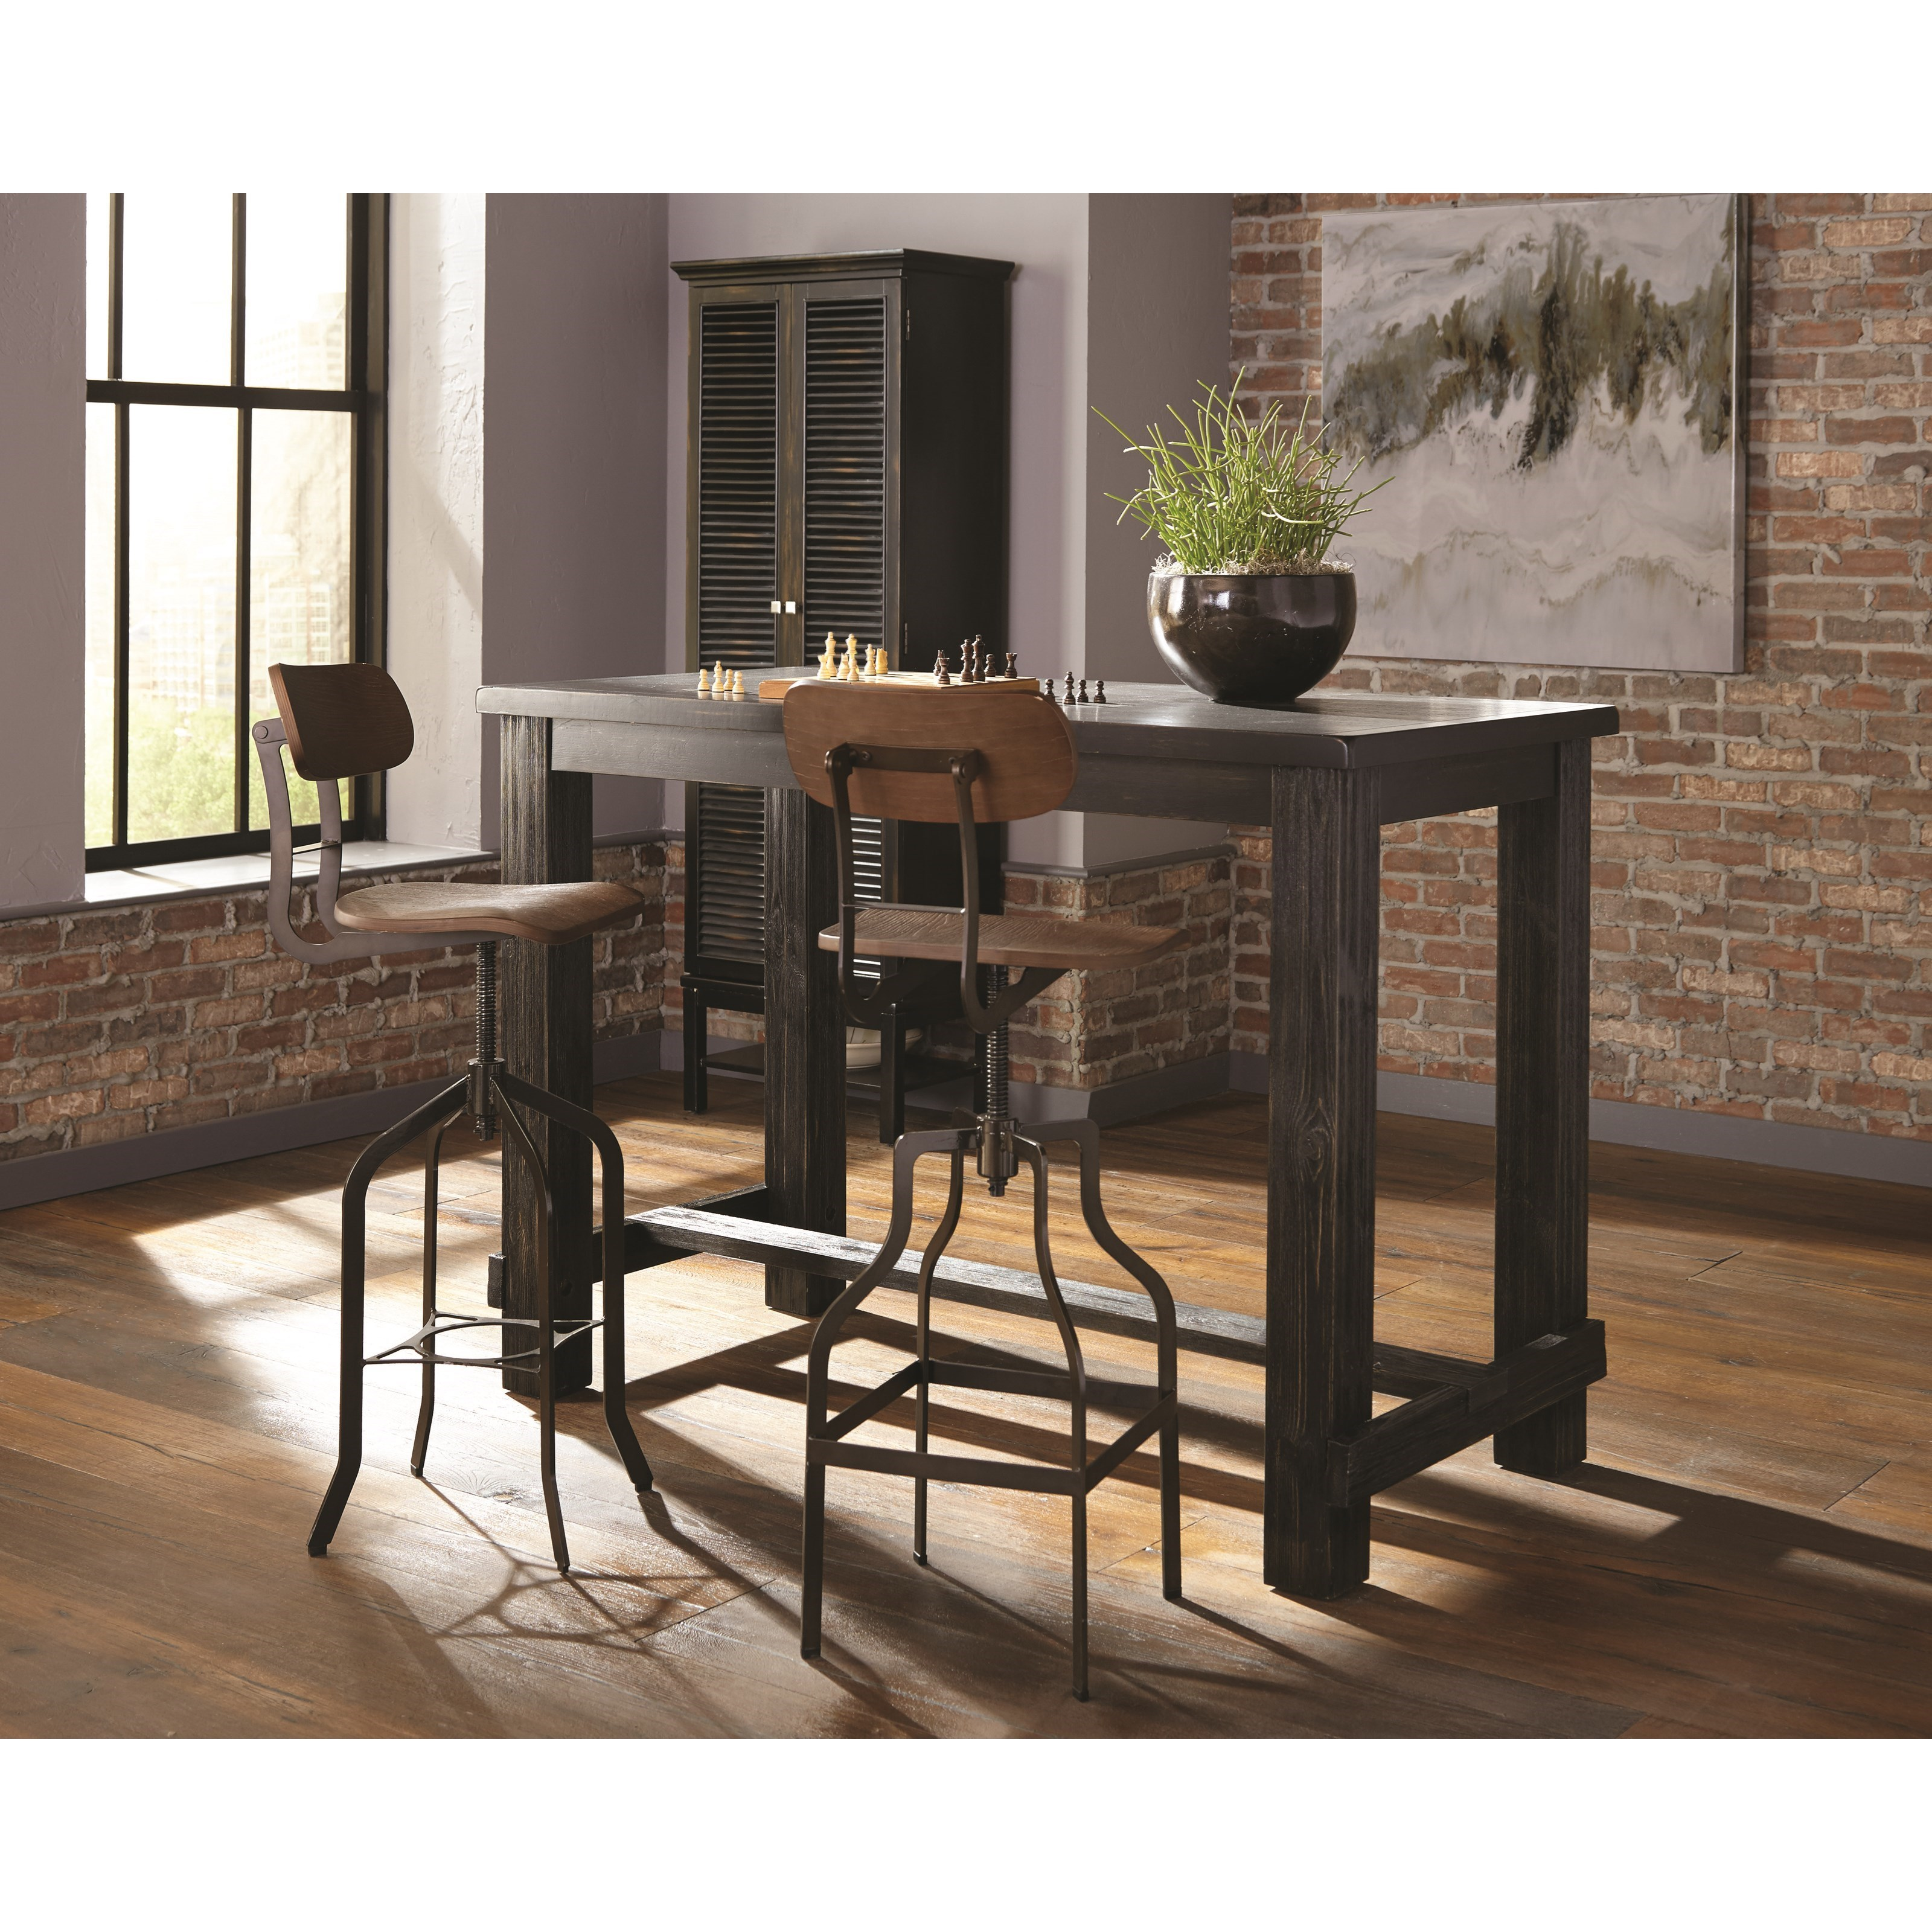 Rustic Craftsman Bar Table